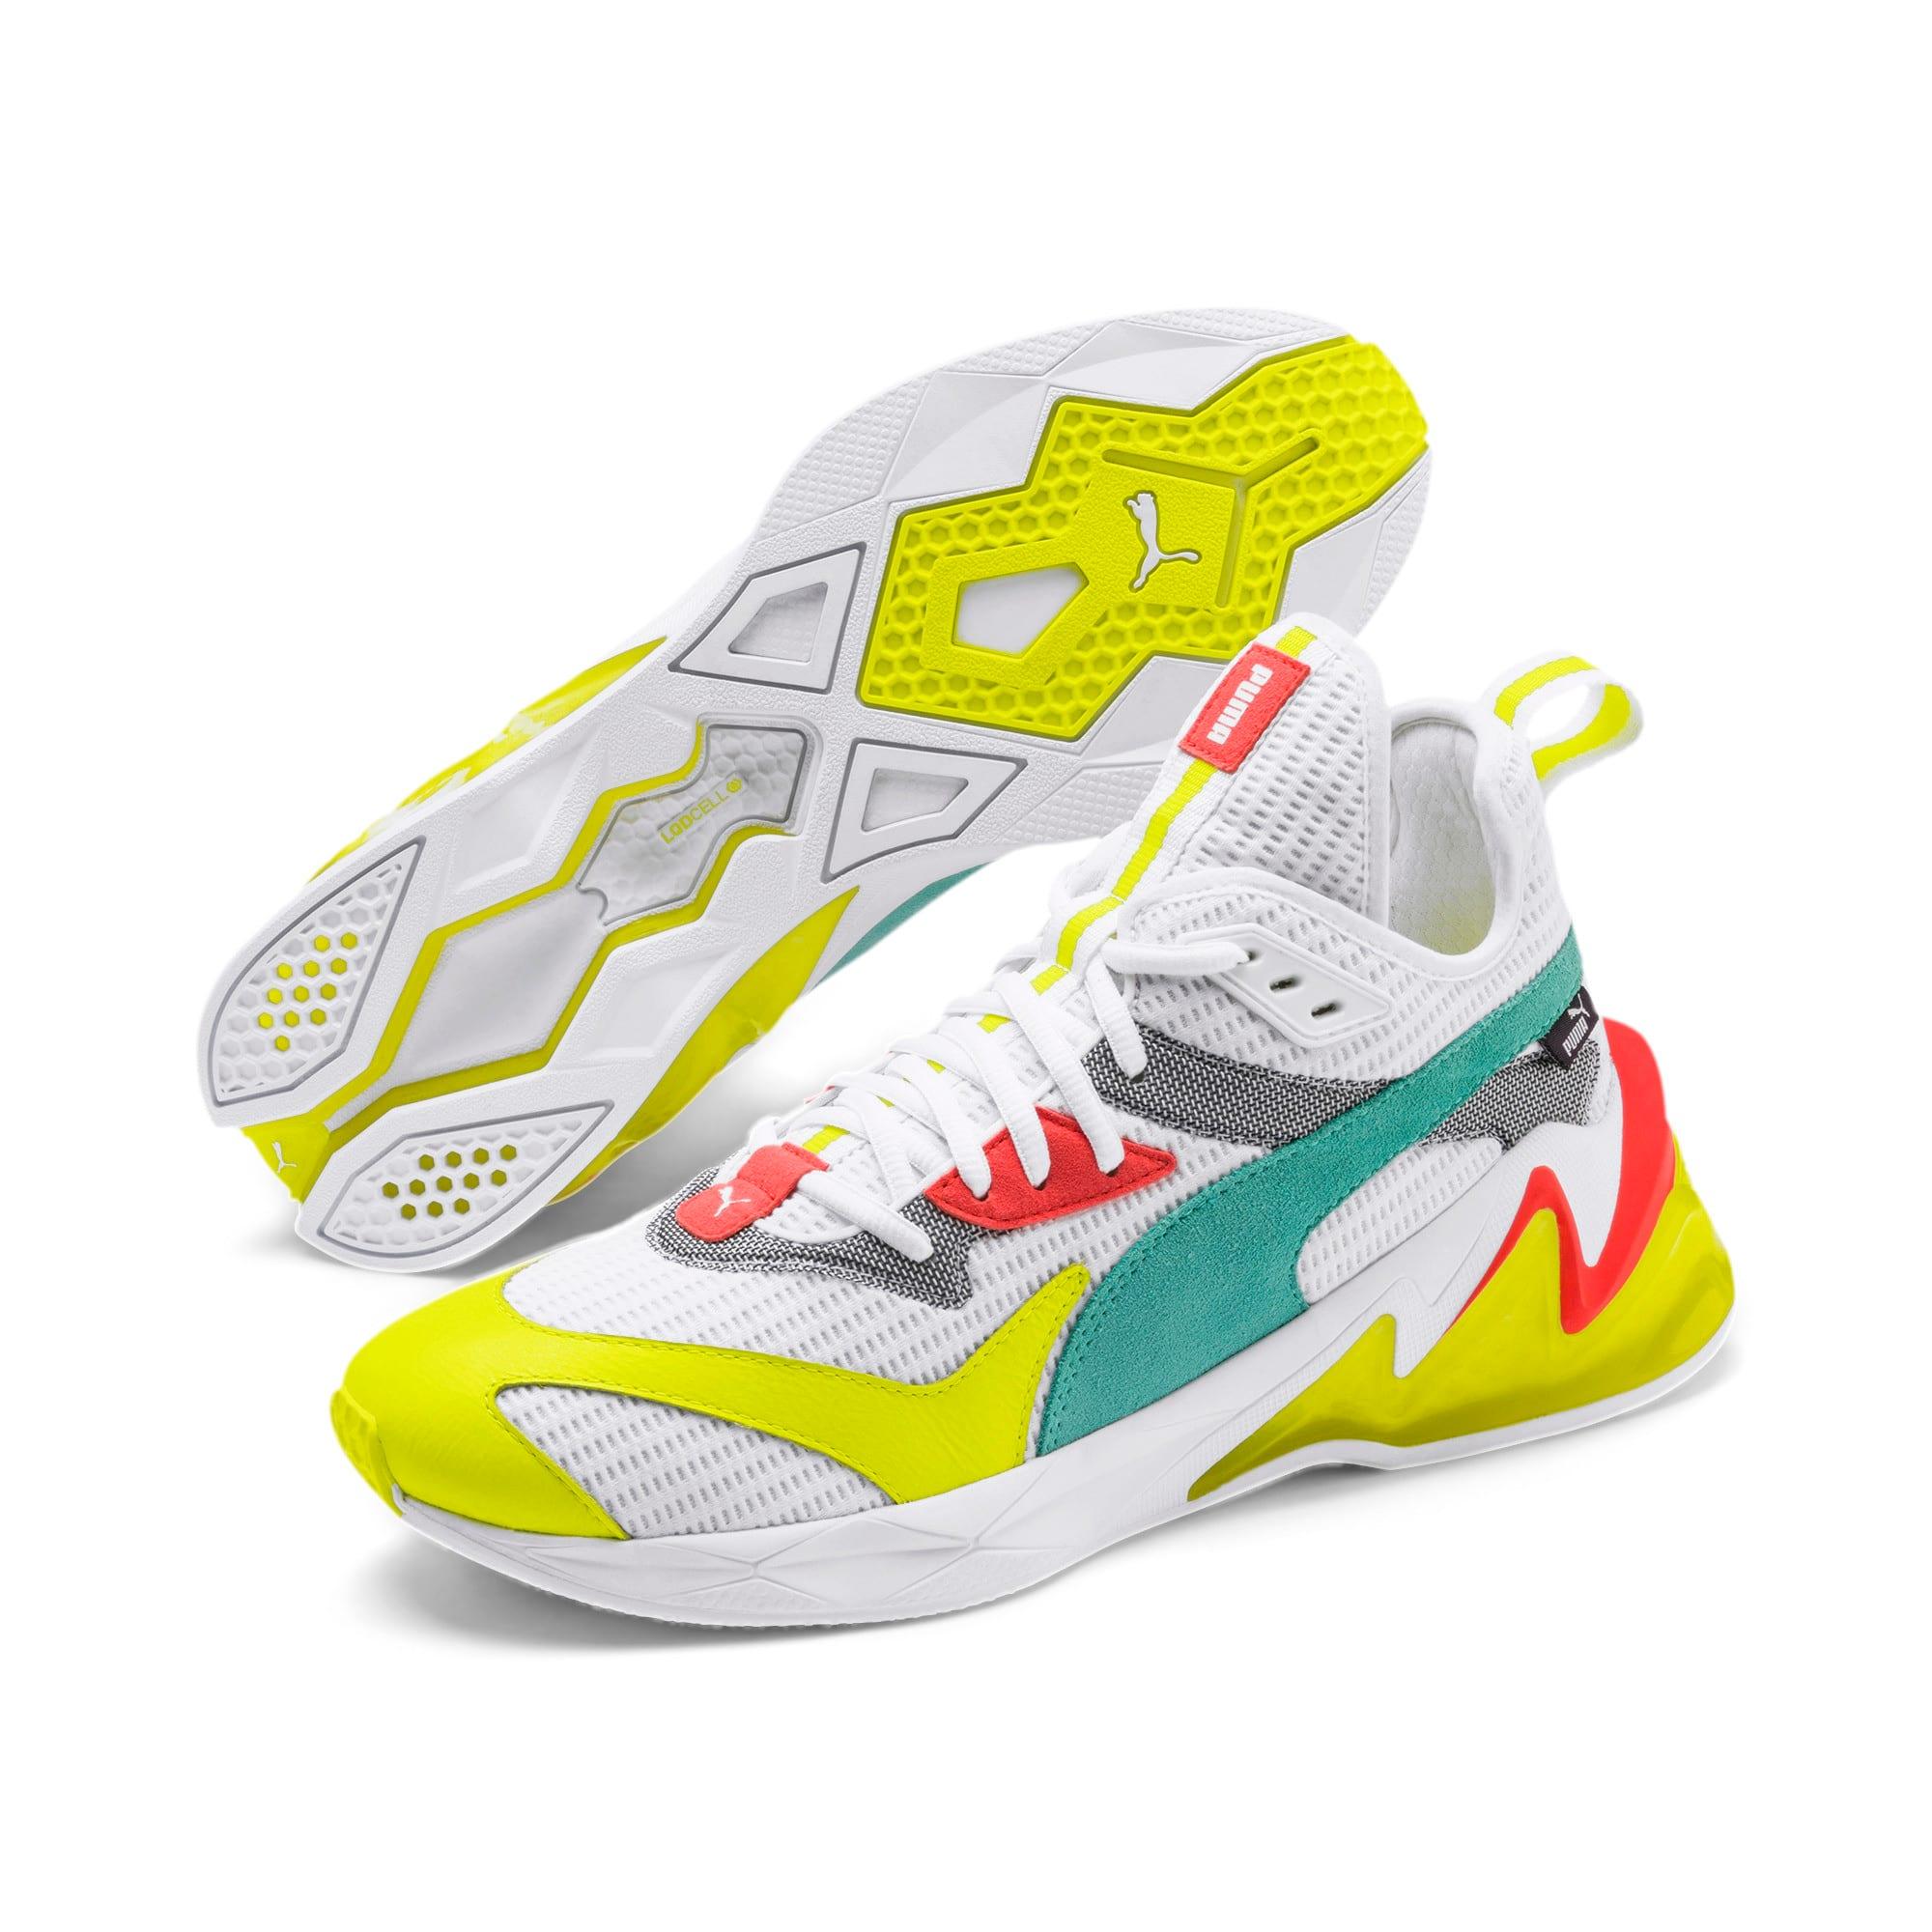 Thumbnail 3 of LQDCELL Origin Men's Training Shoes, Puma White-Yellow Alert, medium